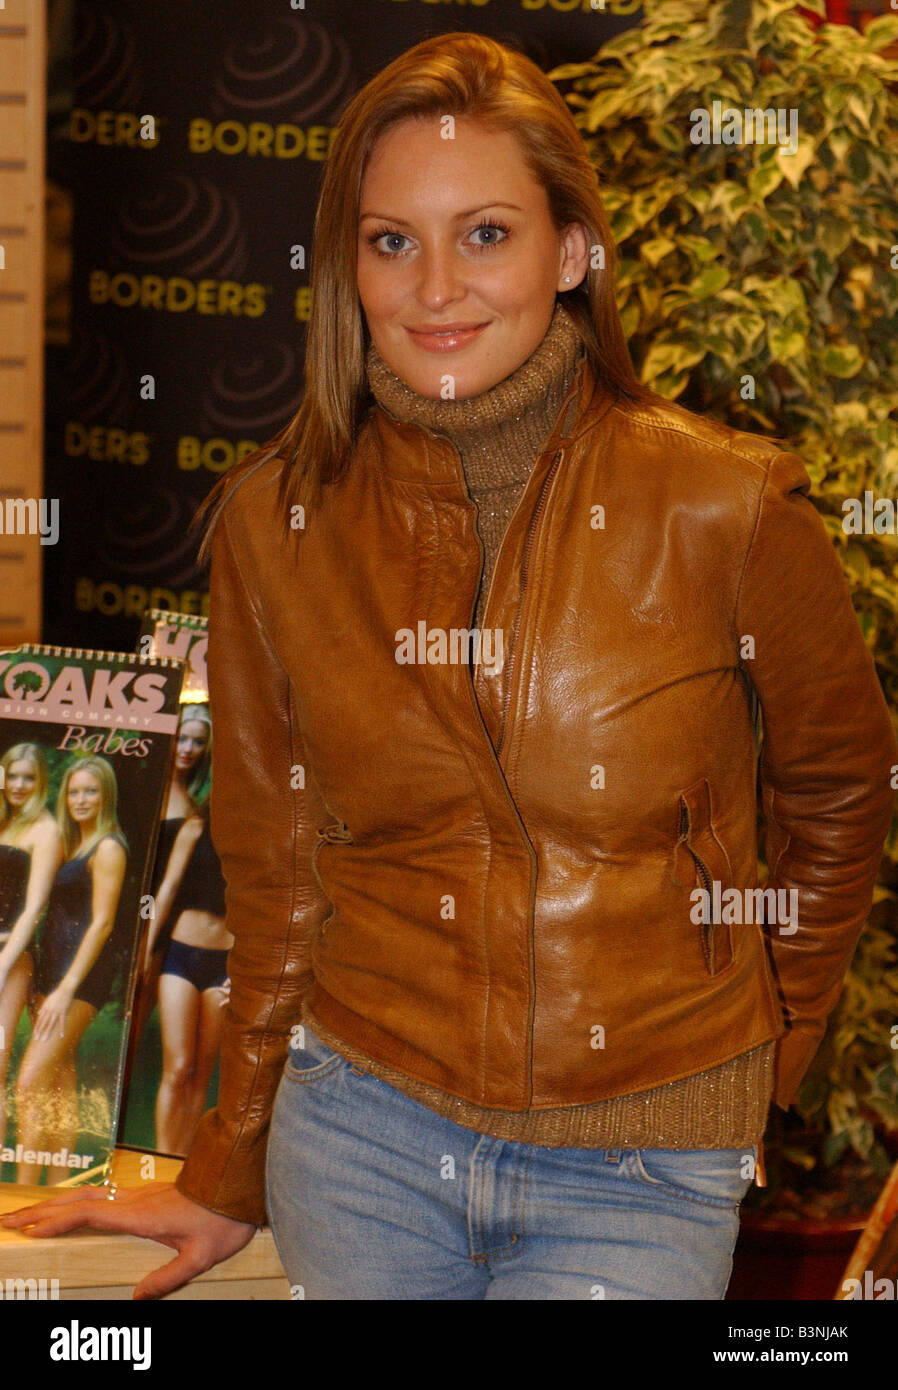 Joanna Taylor November 2001 Actress Pictured at Calendar Signing Borders Bookshop Oxford Street London Portrait - Stock Image